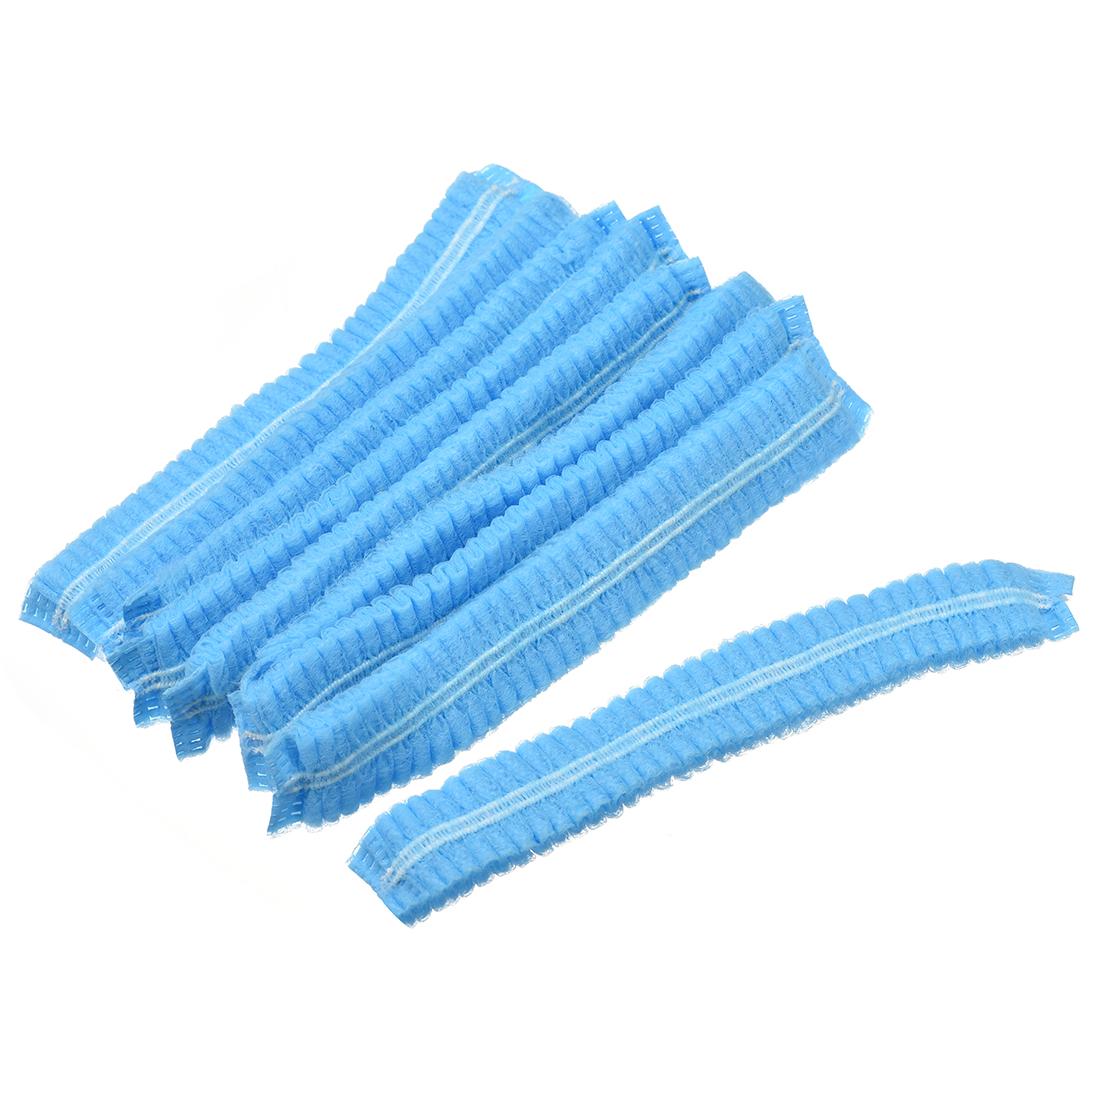 "Bouffant Caps, Size 16.9"", Hair Net, Propene Polymer, Blue, 200Pcs"